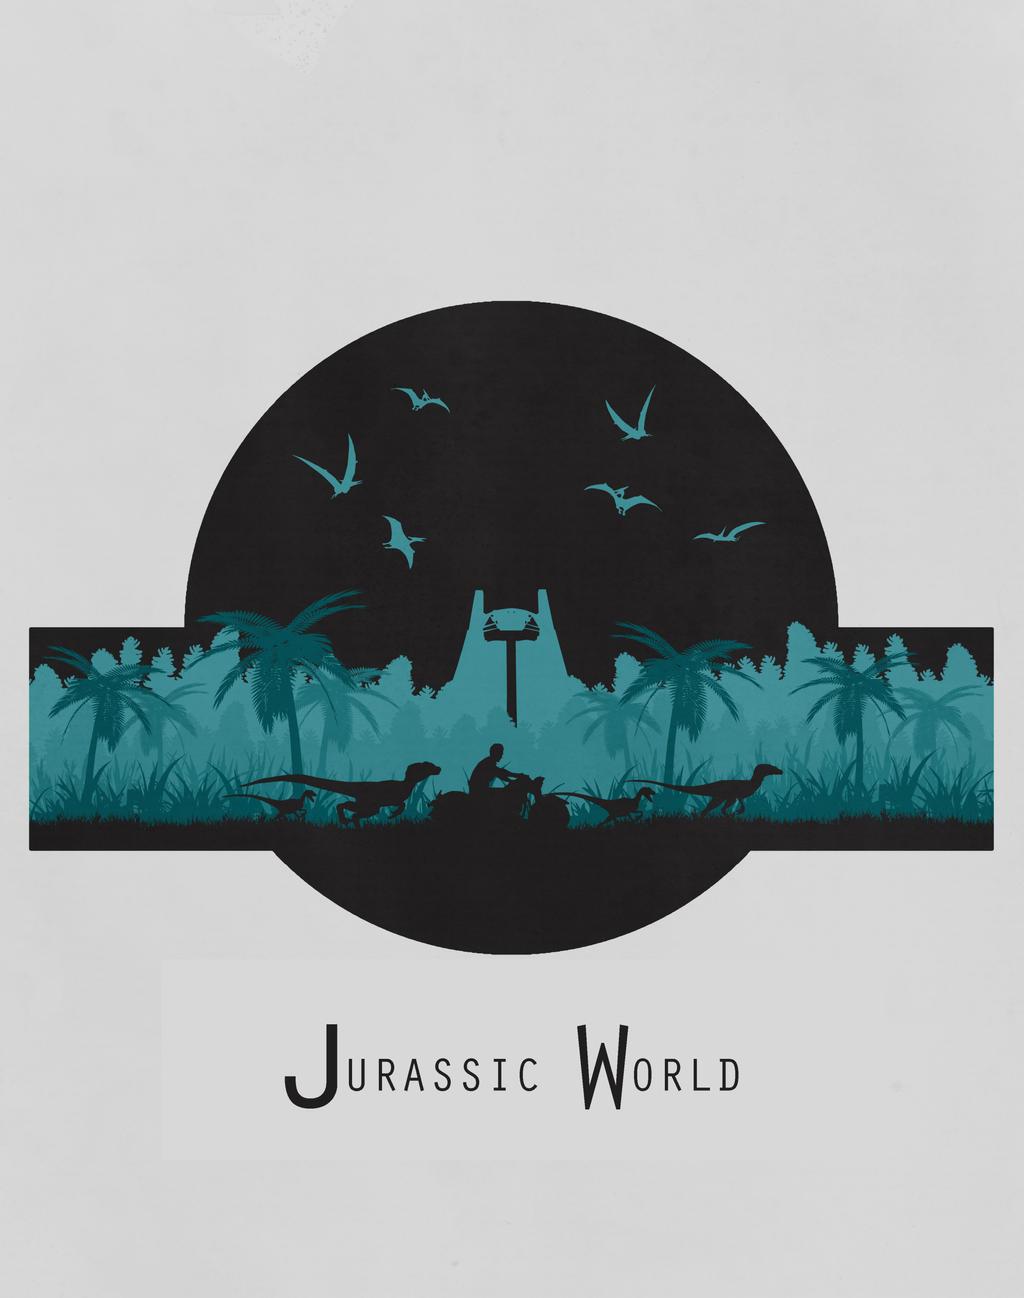 Jurassic World T-shirt Design